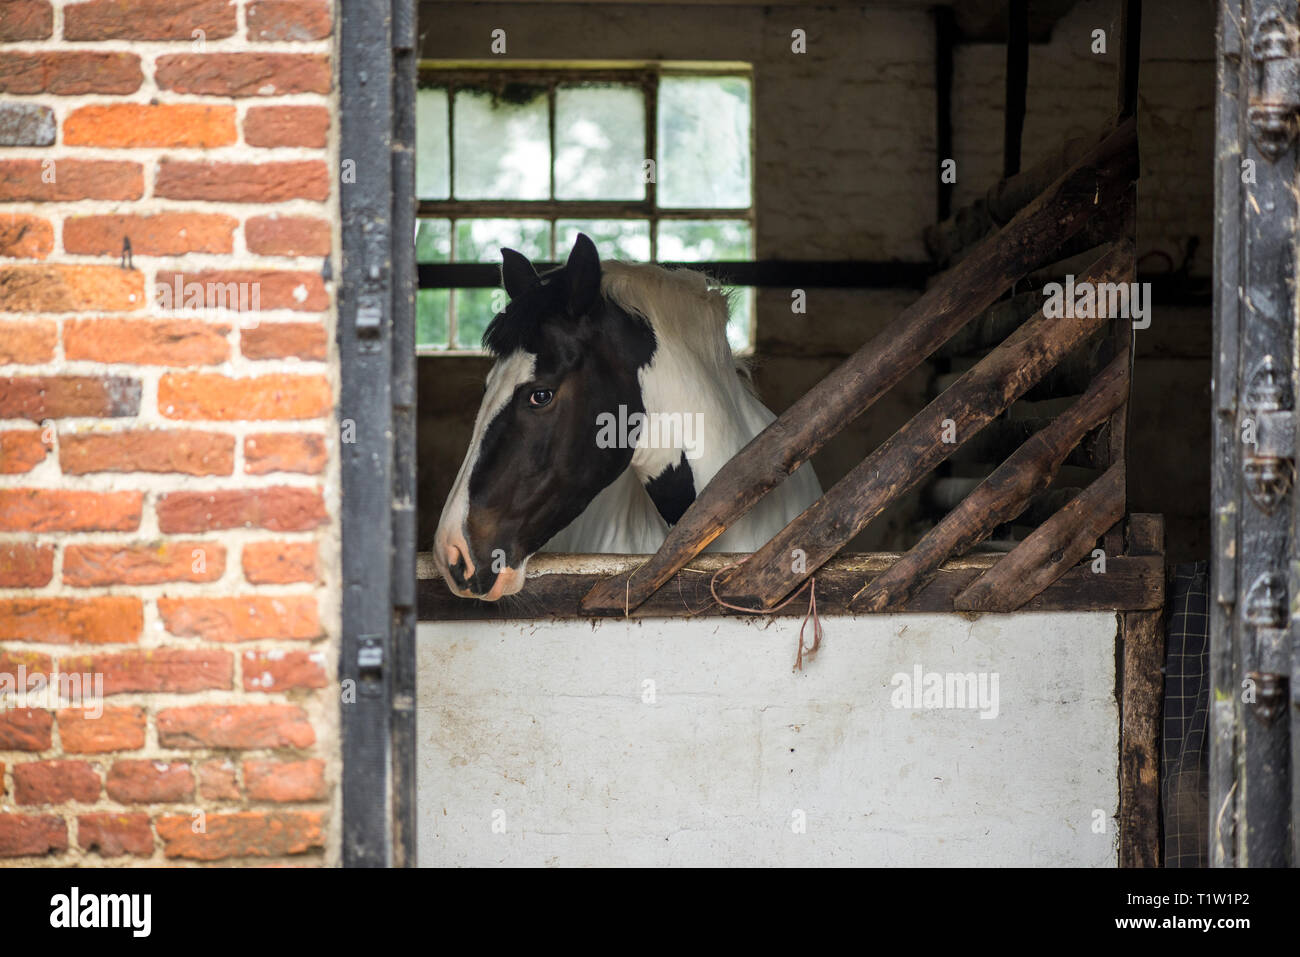 Pferd im Stall Stallungen Stockbild